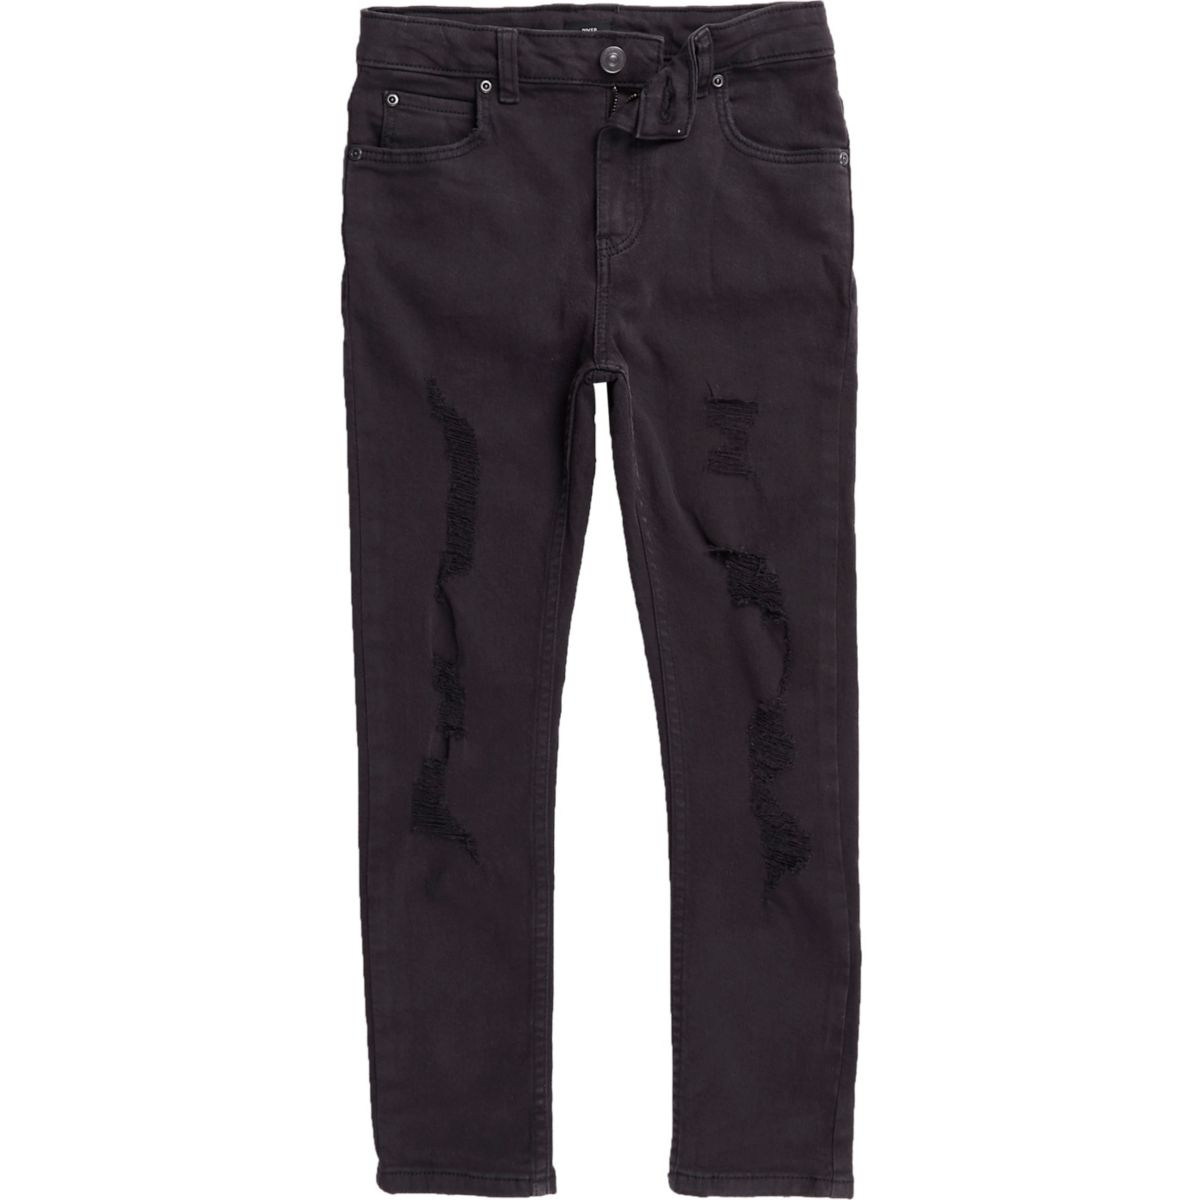 Boys black ripped Sid skinny jeans